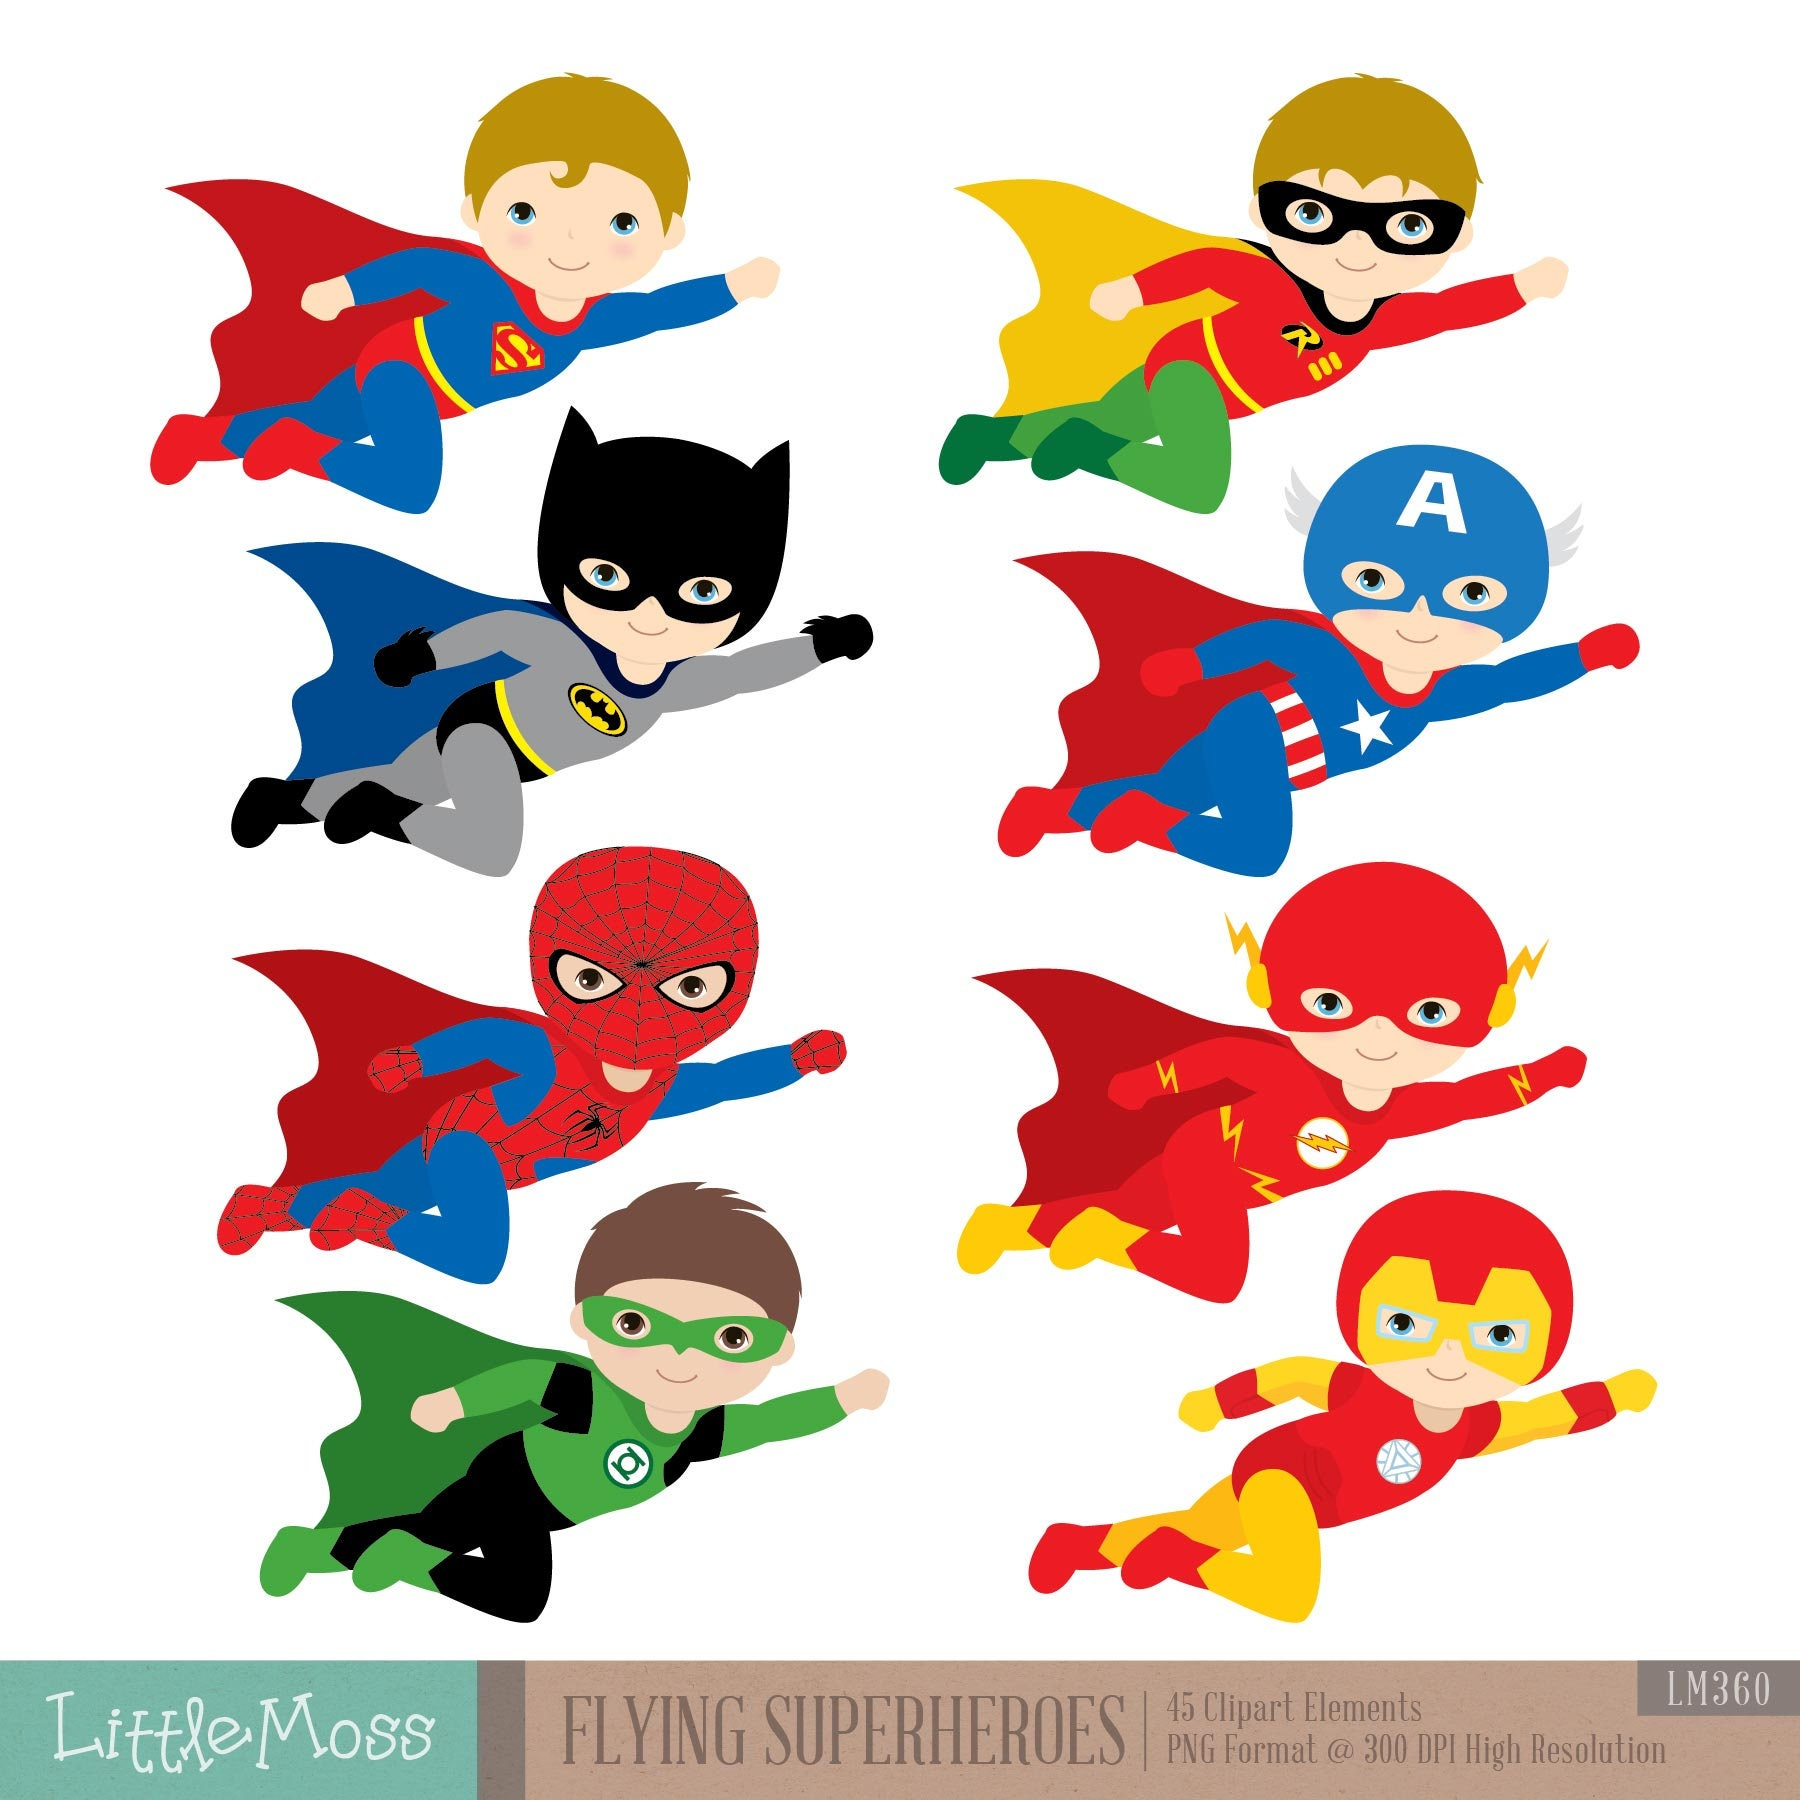 SUPER HERO Movie HD free download 720p